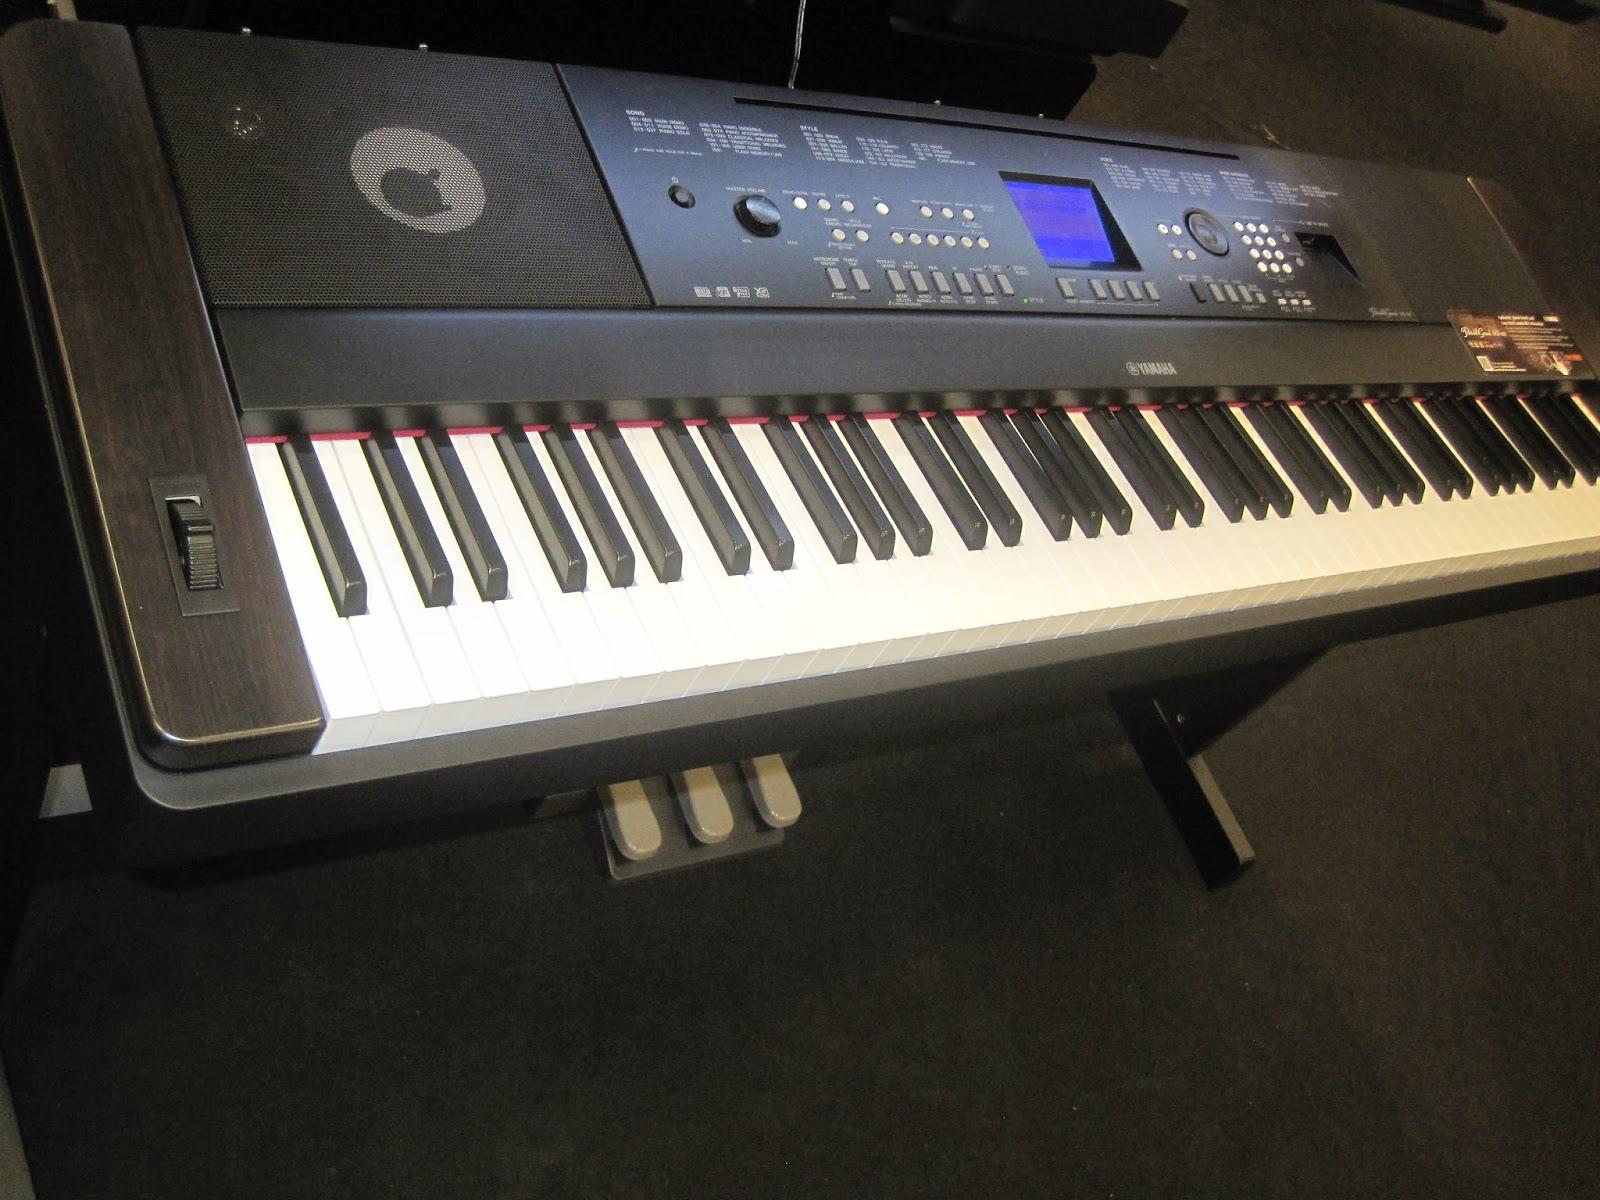 Az piano reviews review yamaha dgx650 digital piano for Digital piano keyboard yamaha